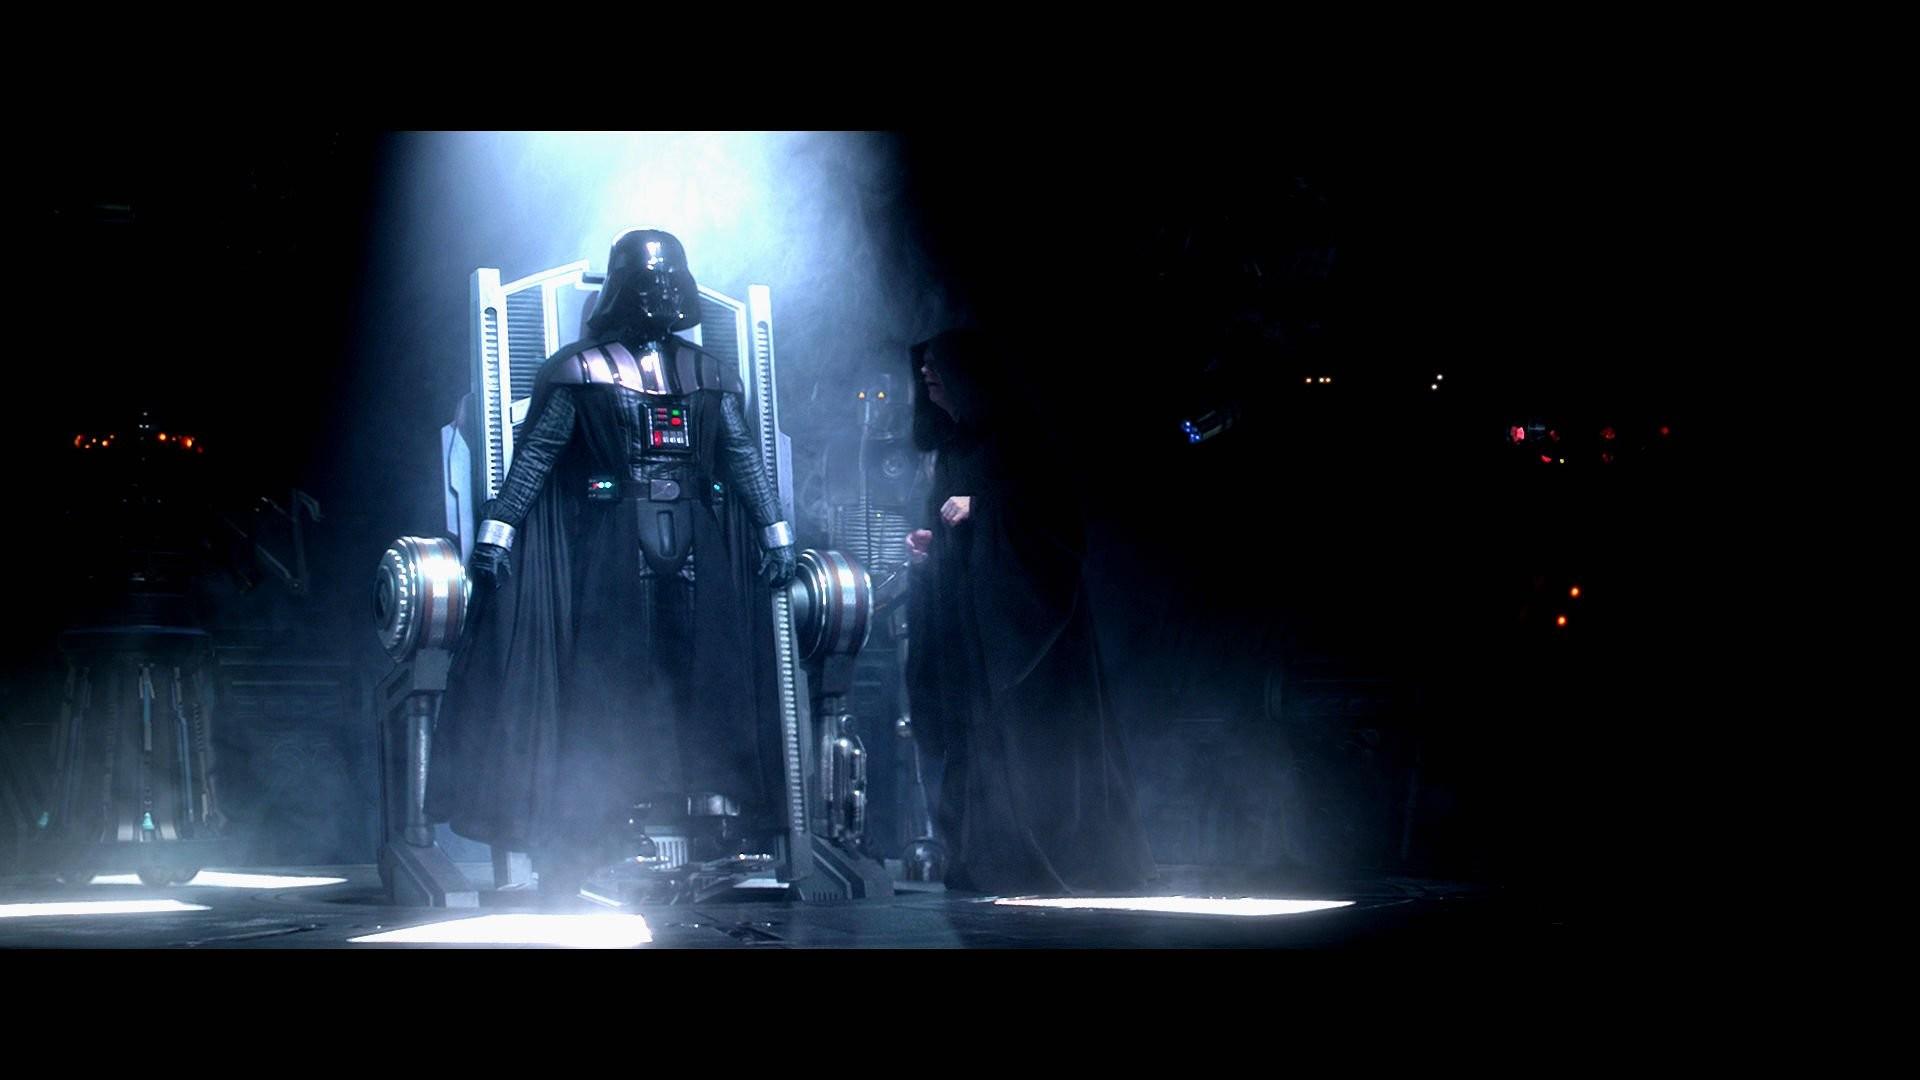 1920x1080 Banner: Sith Empire